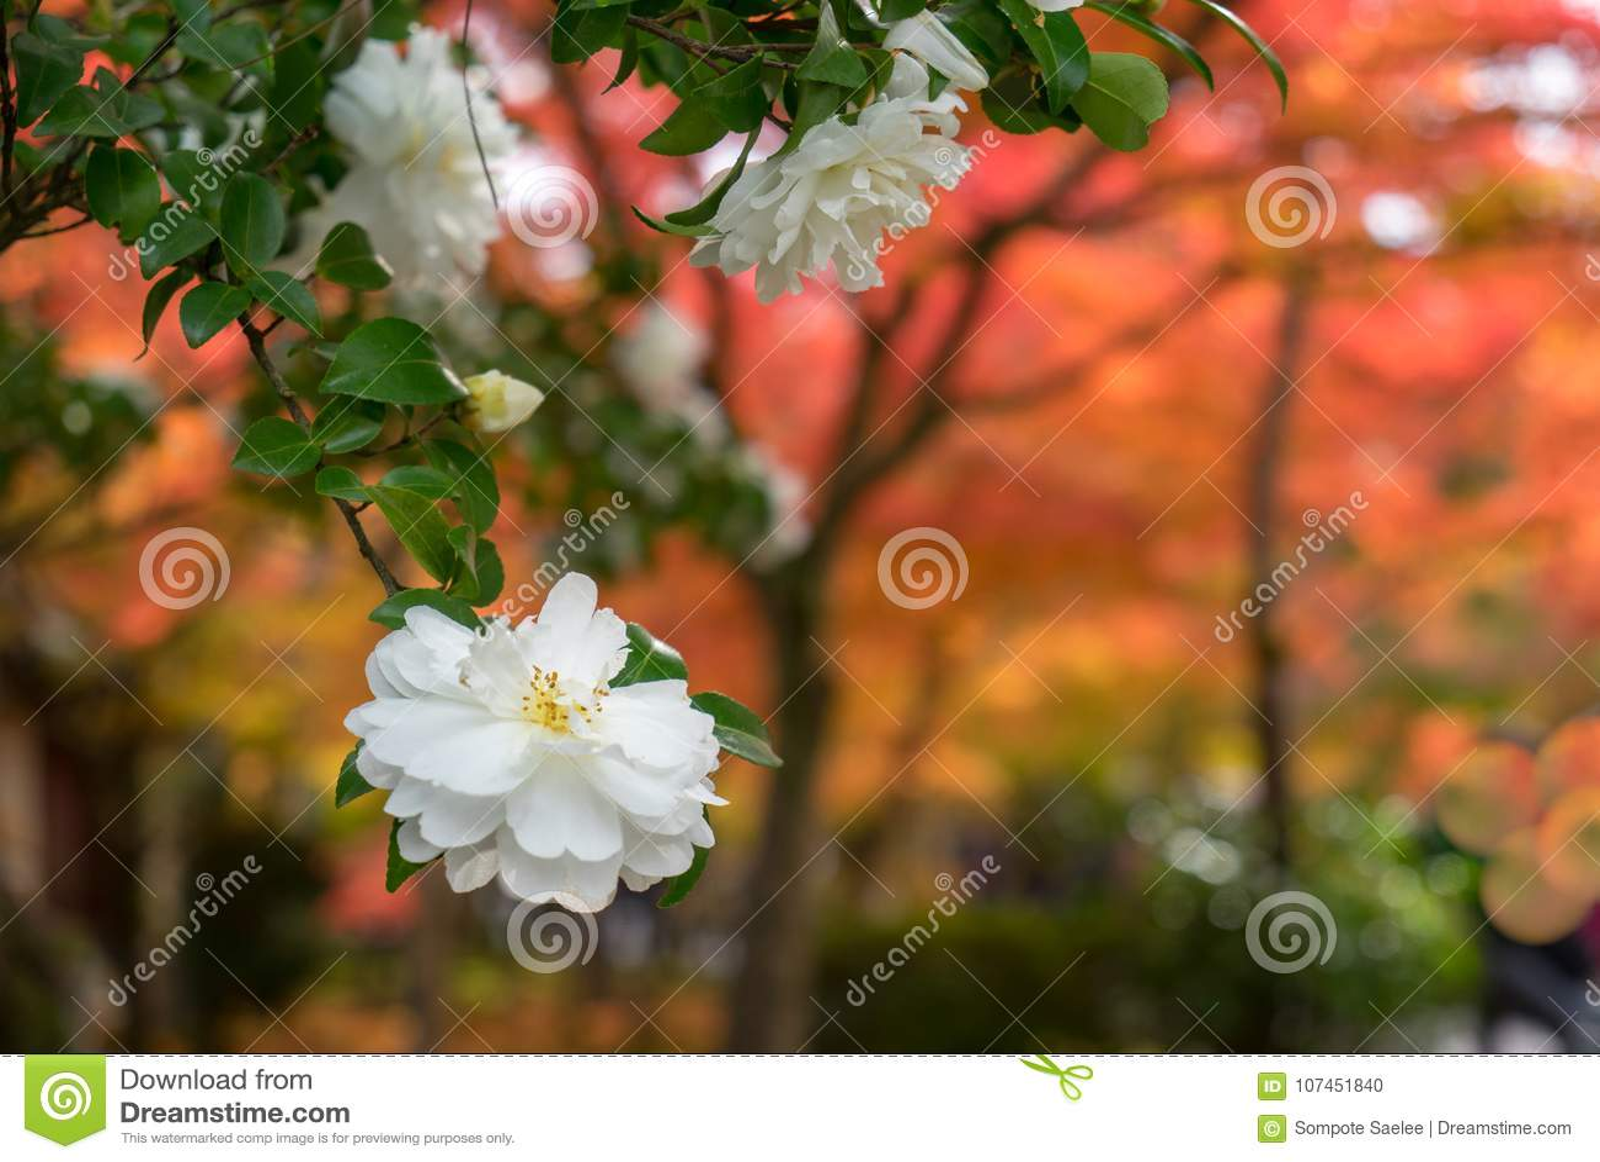 White Japanese Camellia Flower With Soft Focus Orange Autumn Trees